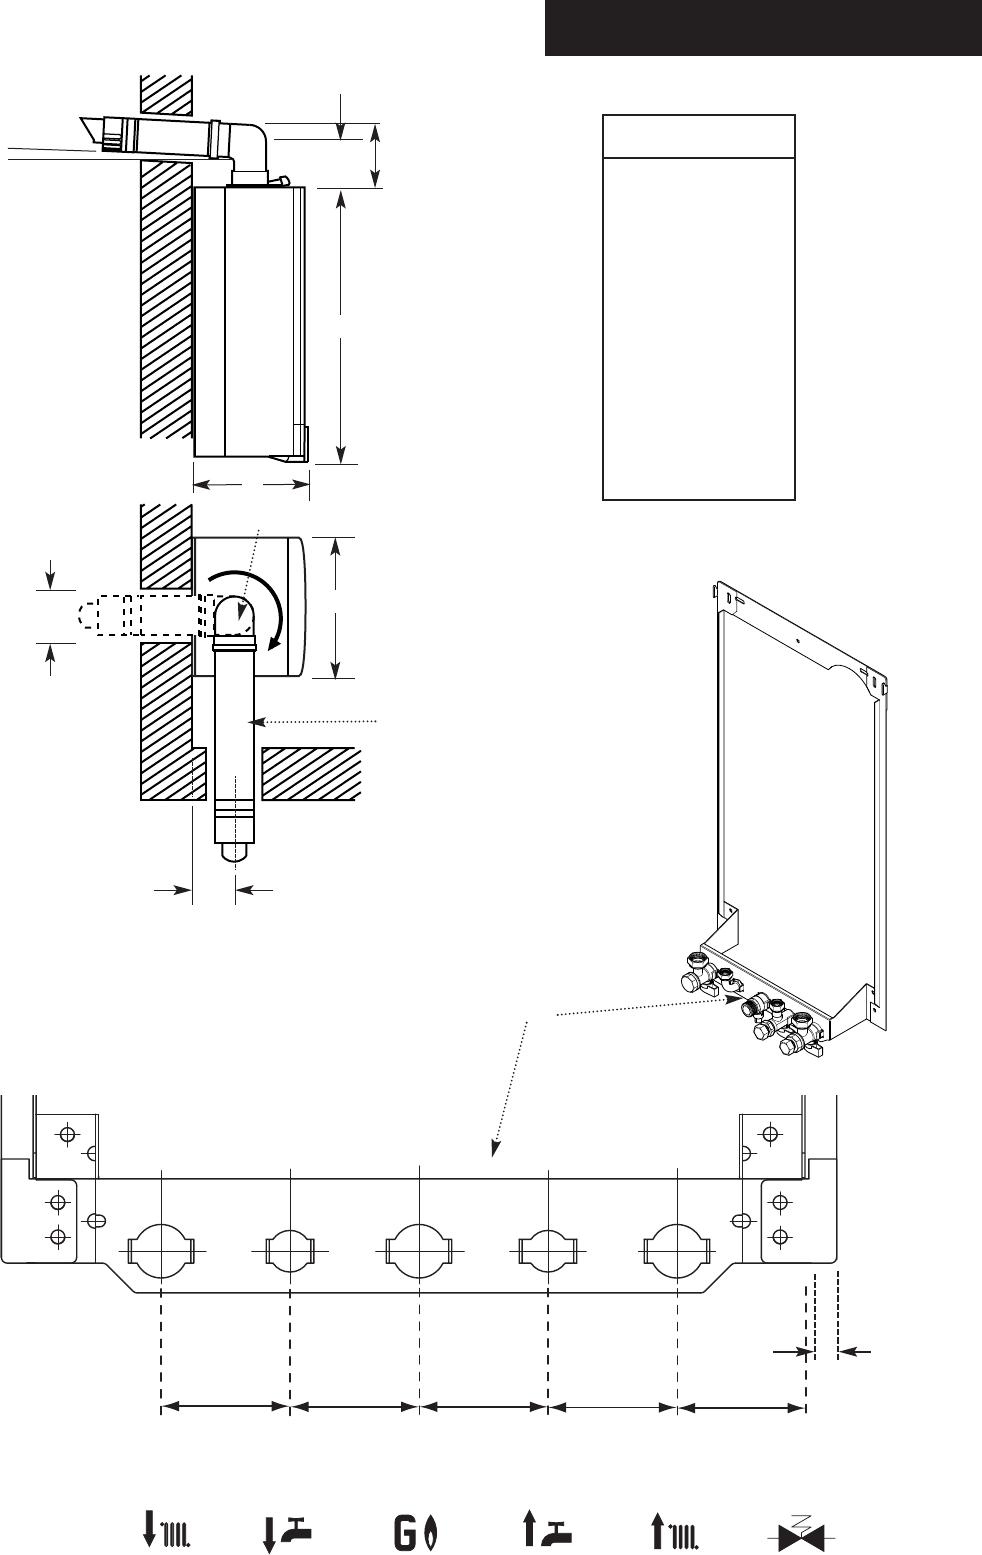 Potterton Performa 24 >> Baxi Potterton Performa 24 Eco He 5 0 Dimensions And Fixings